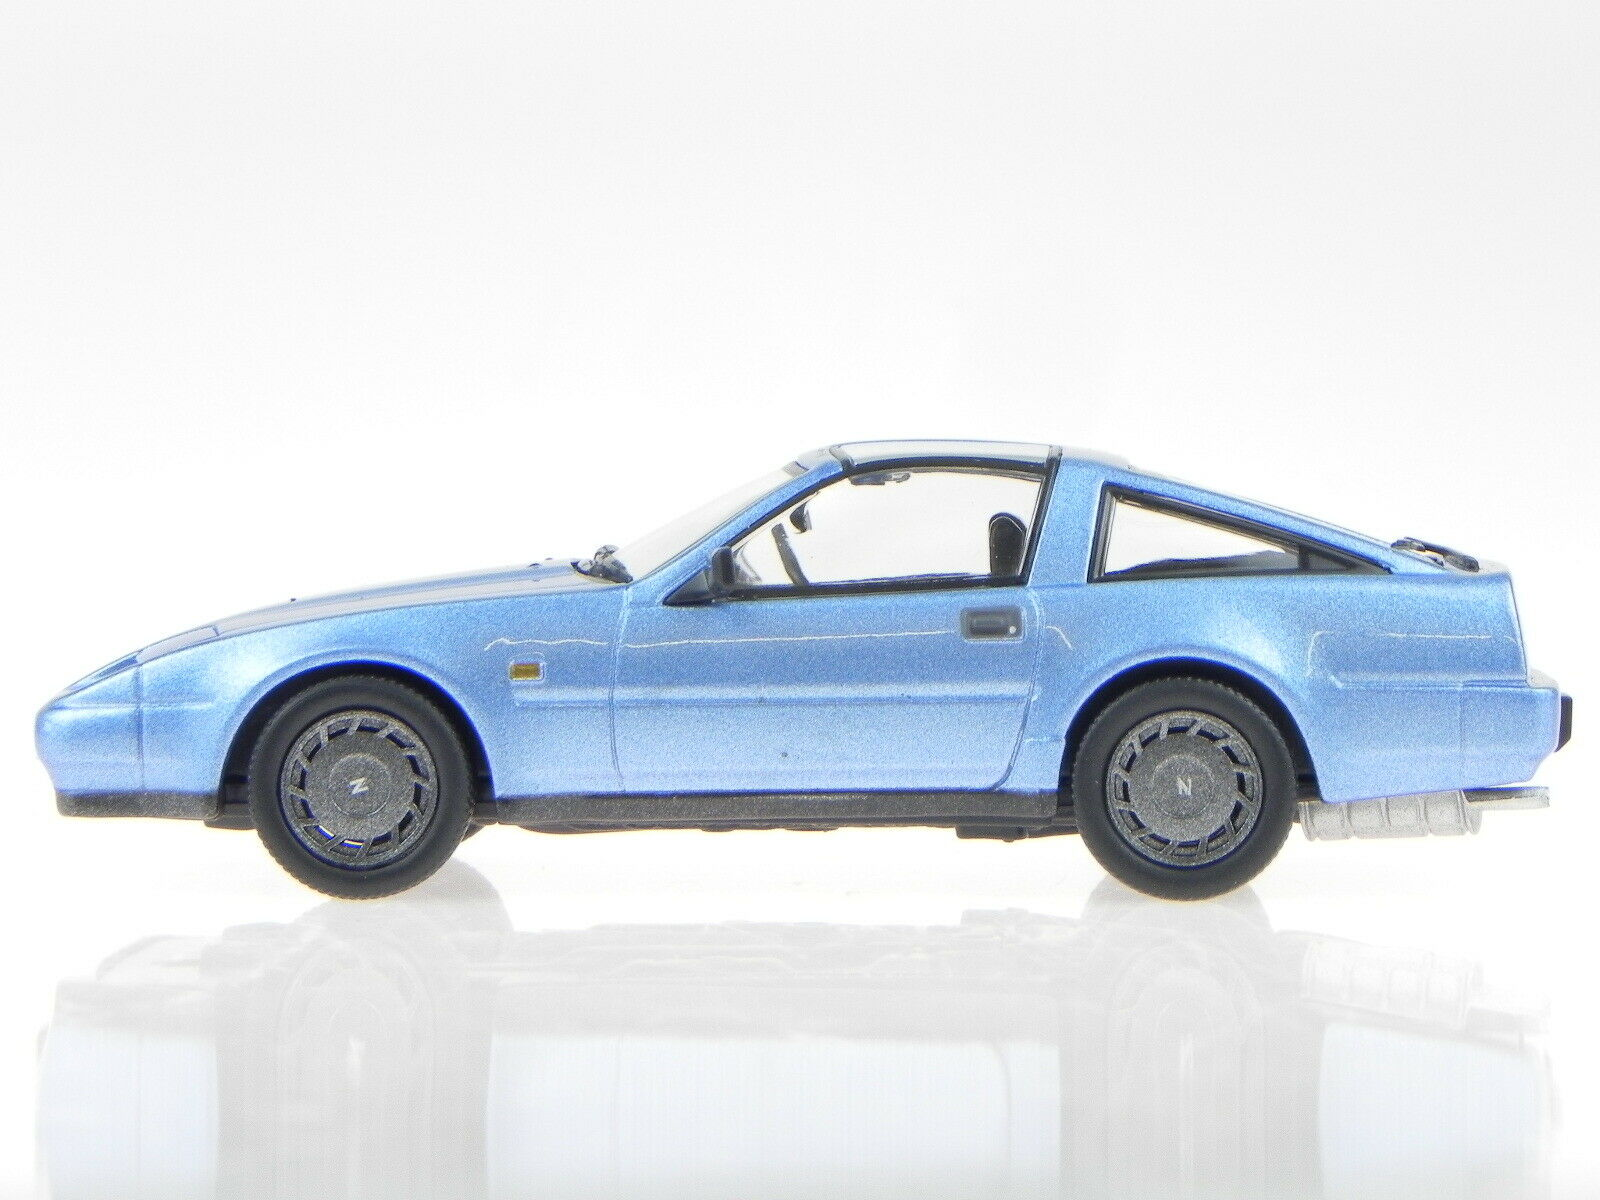 Nissan Fairlady Z 300ZR 300ZX HZ31 Coupe Rot 1983-1989 1//43 Kyosho Modell Auto m